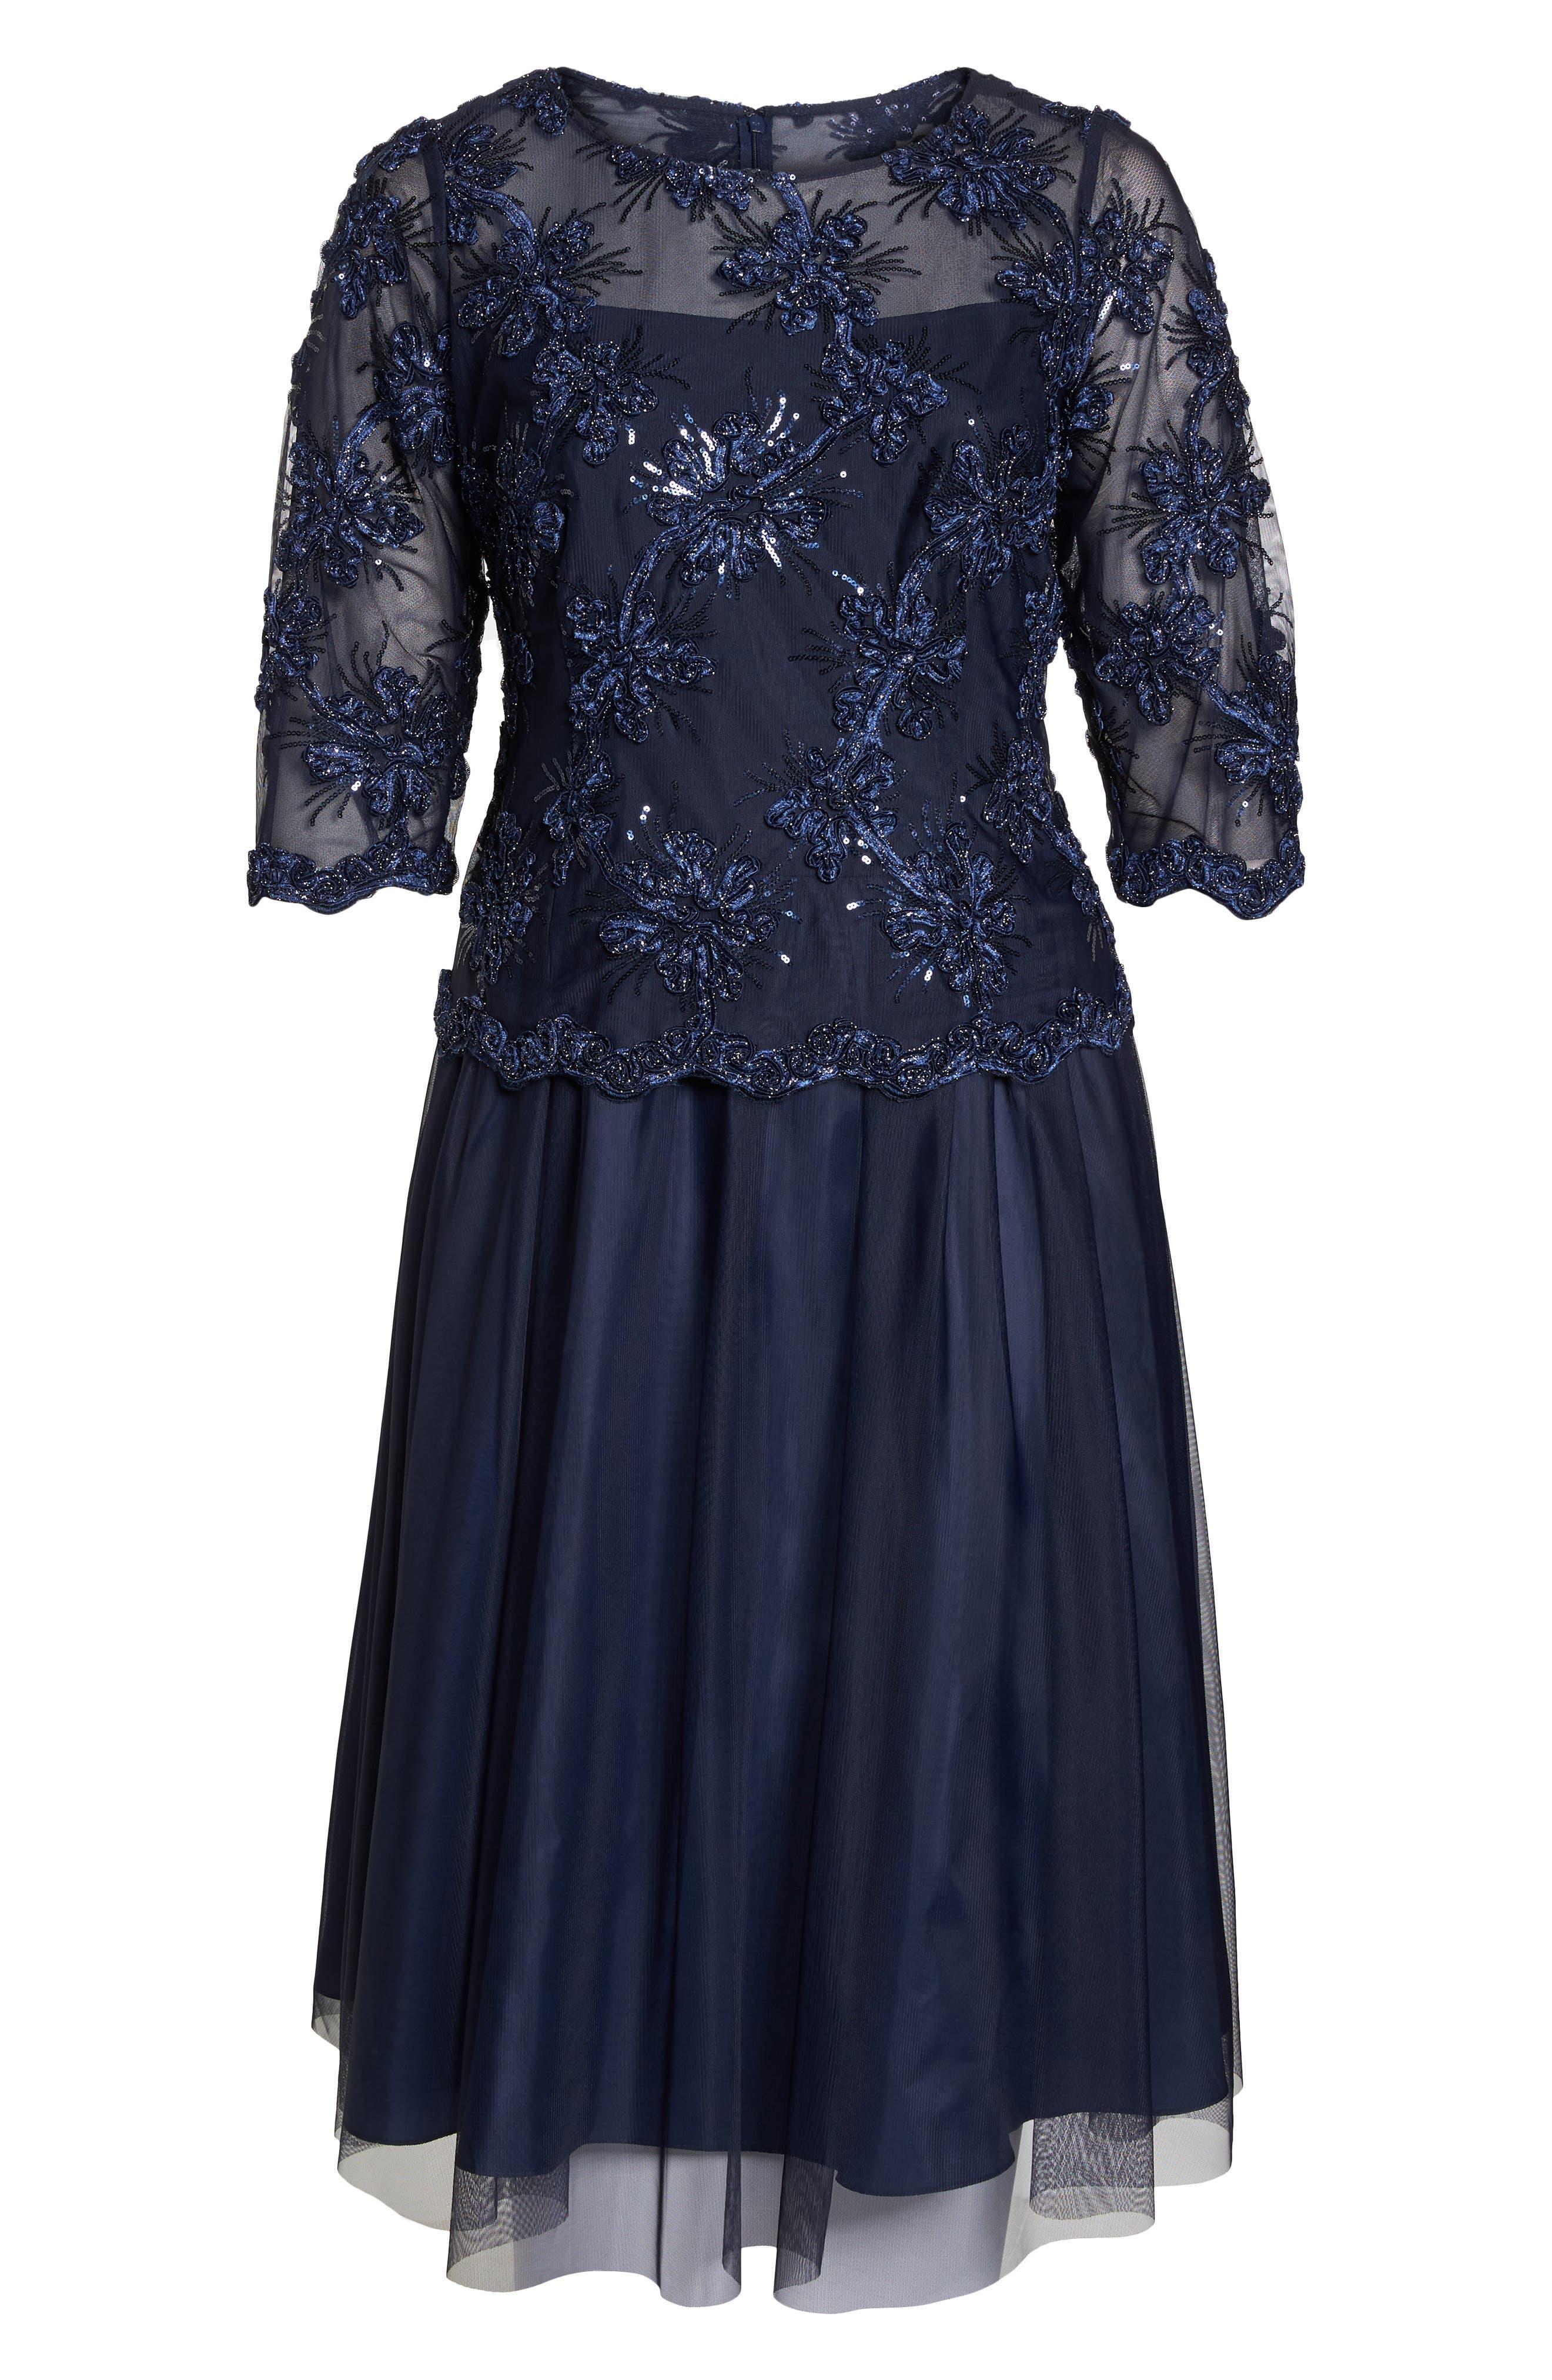 Embellished Bodice Tea Length Mesh Dress,                             Alternate thumbnail 6, color,                             Navy